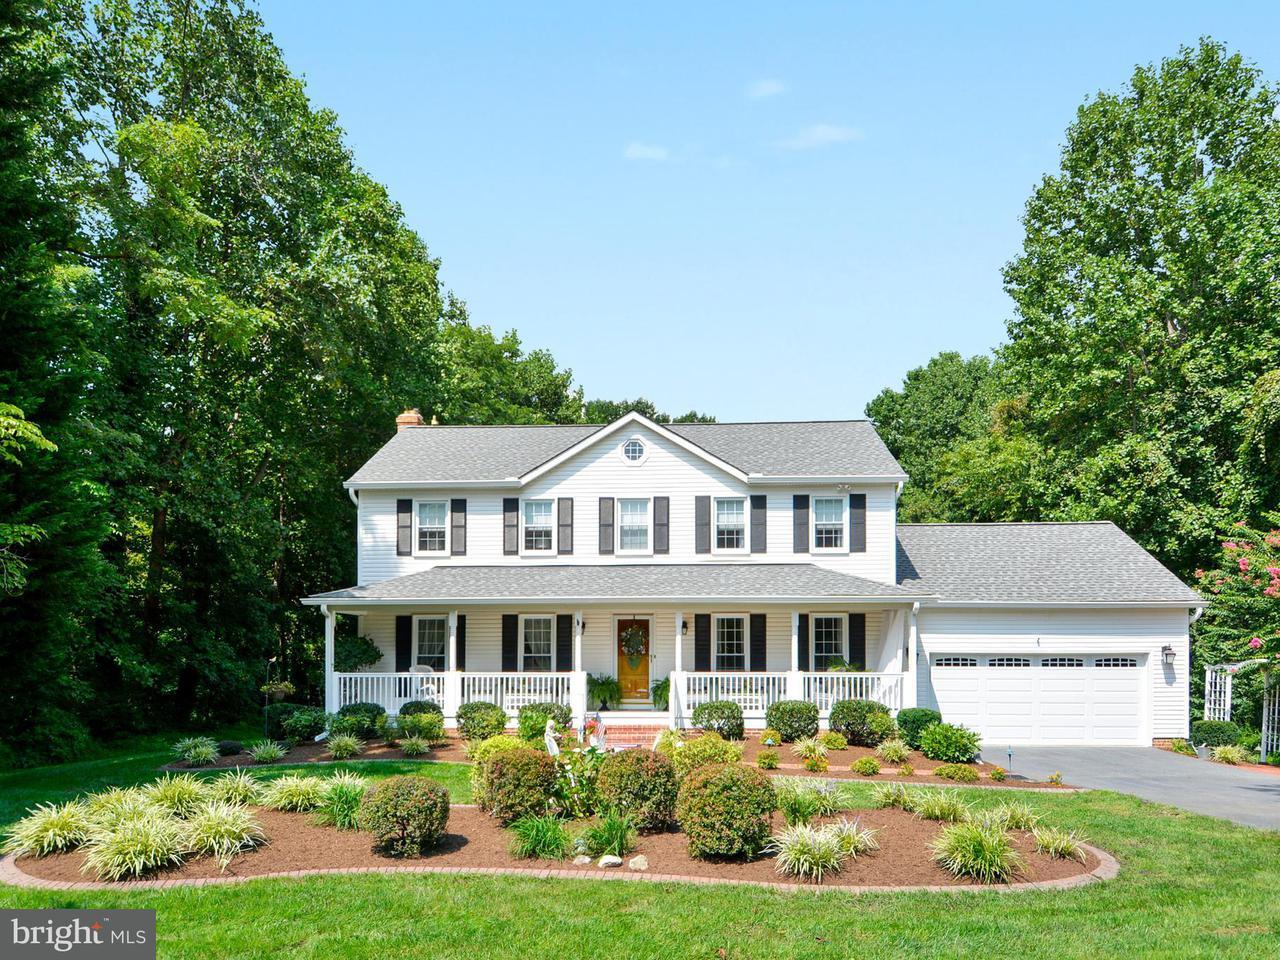 Single Family Home for Sale at 6400 HEATHCLIFF Lane 6400 HEATHCLIFF Lane Tracys Landing, Maryland 20779 United States